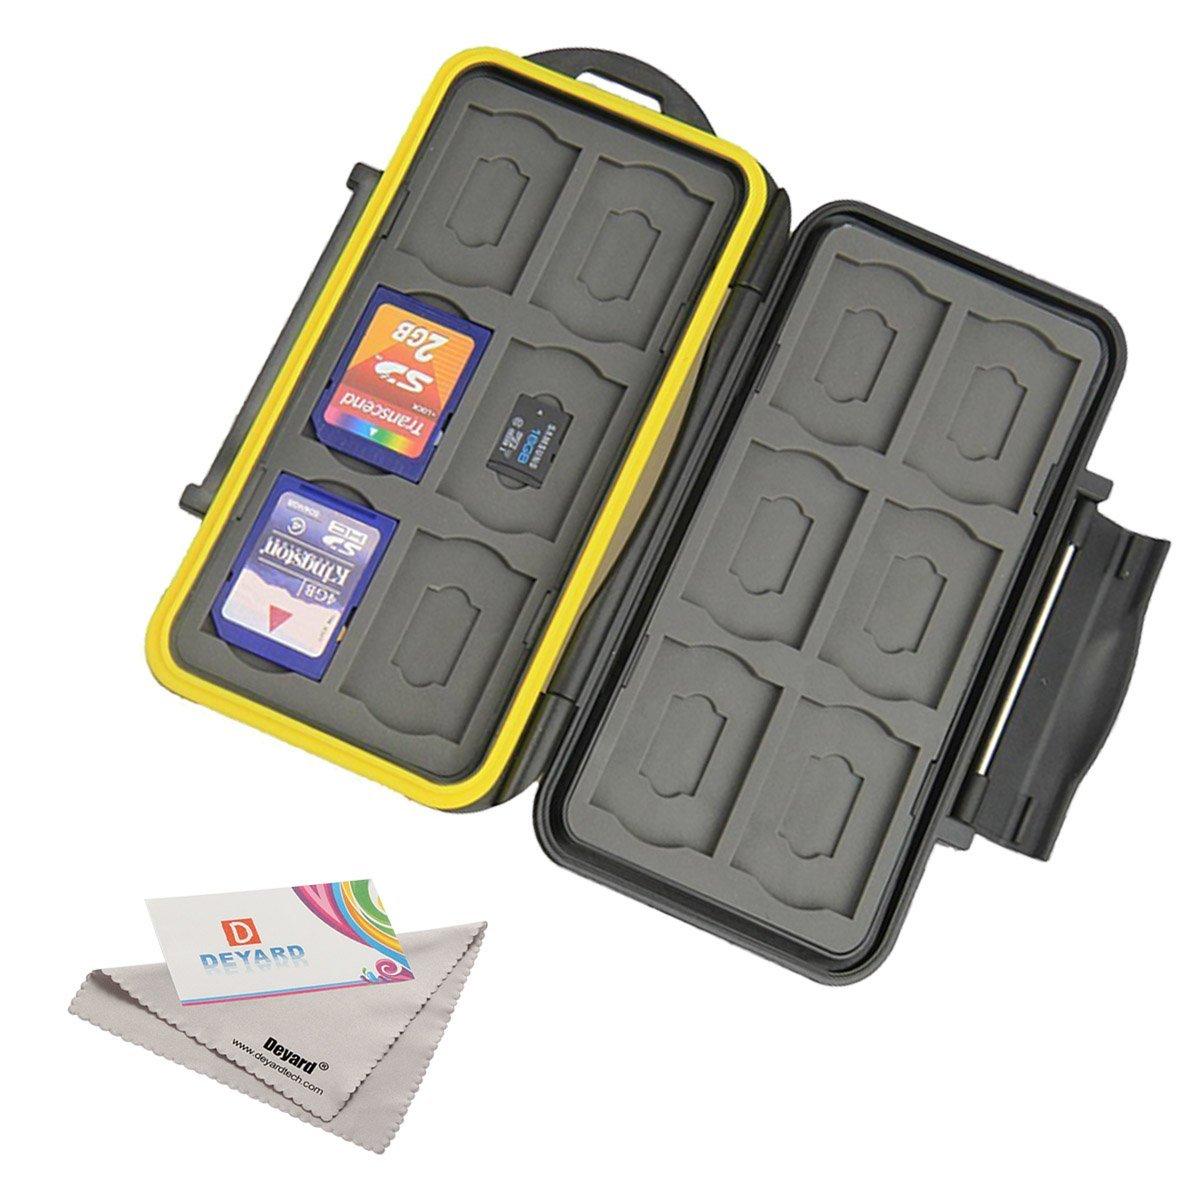 Deyard 防水SDメモリー用カードケース SDカード12枚、microSDカード12枚